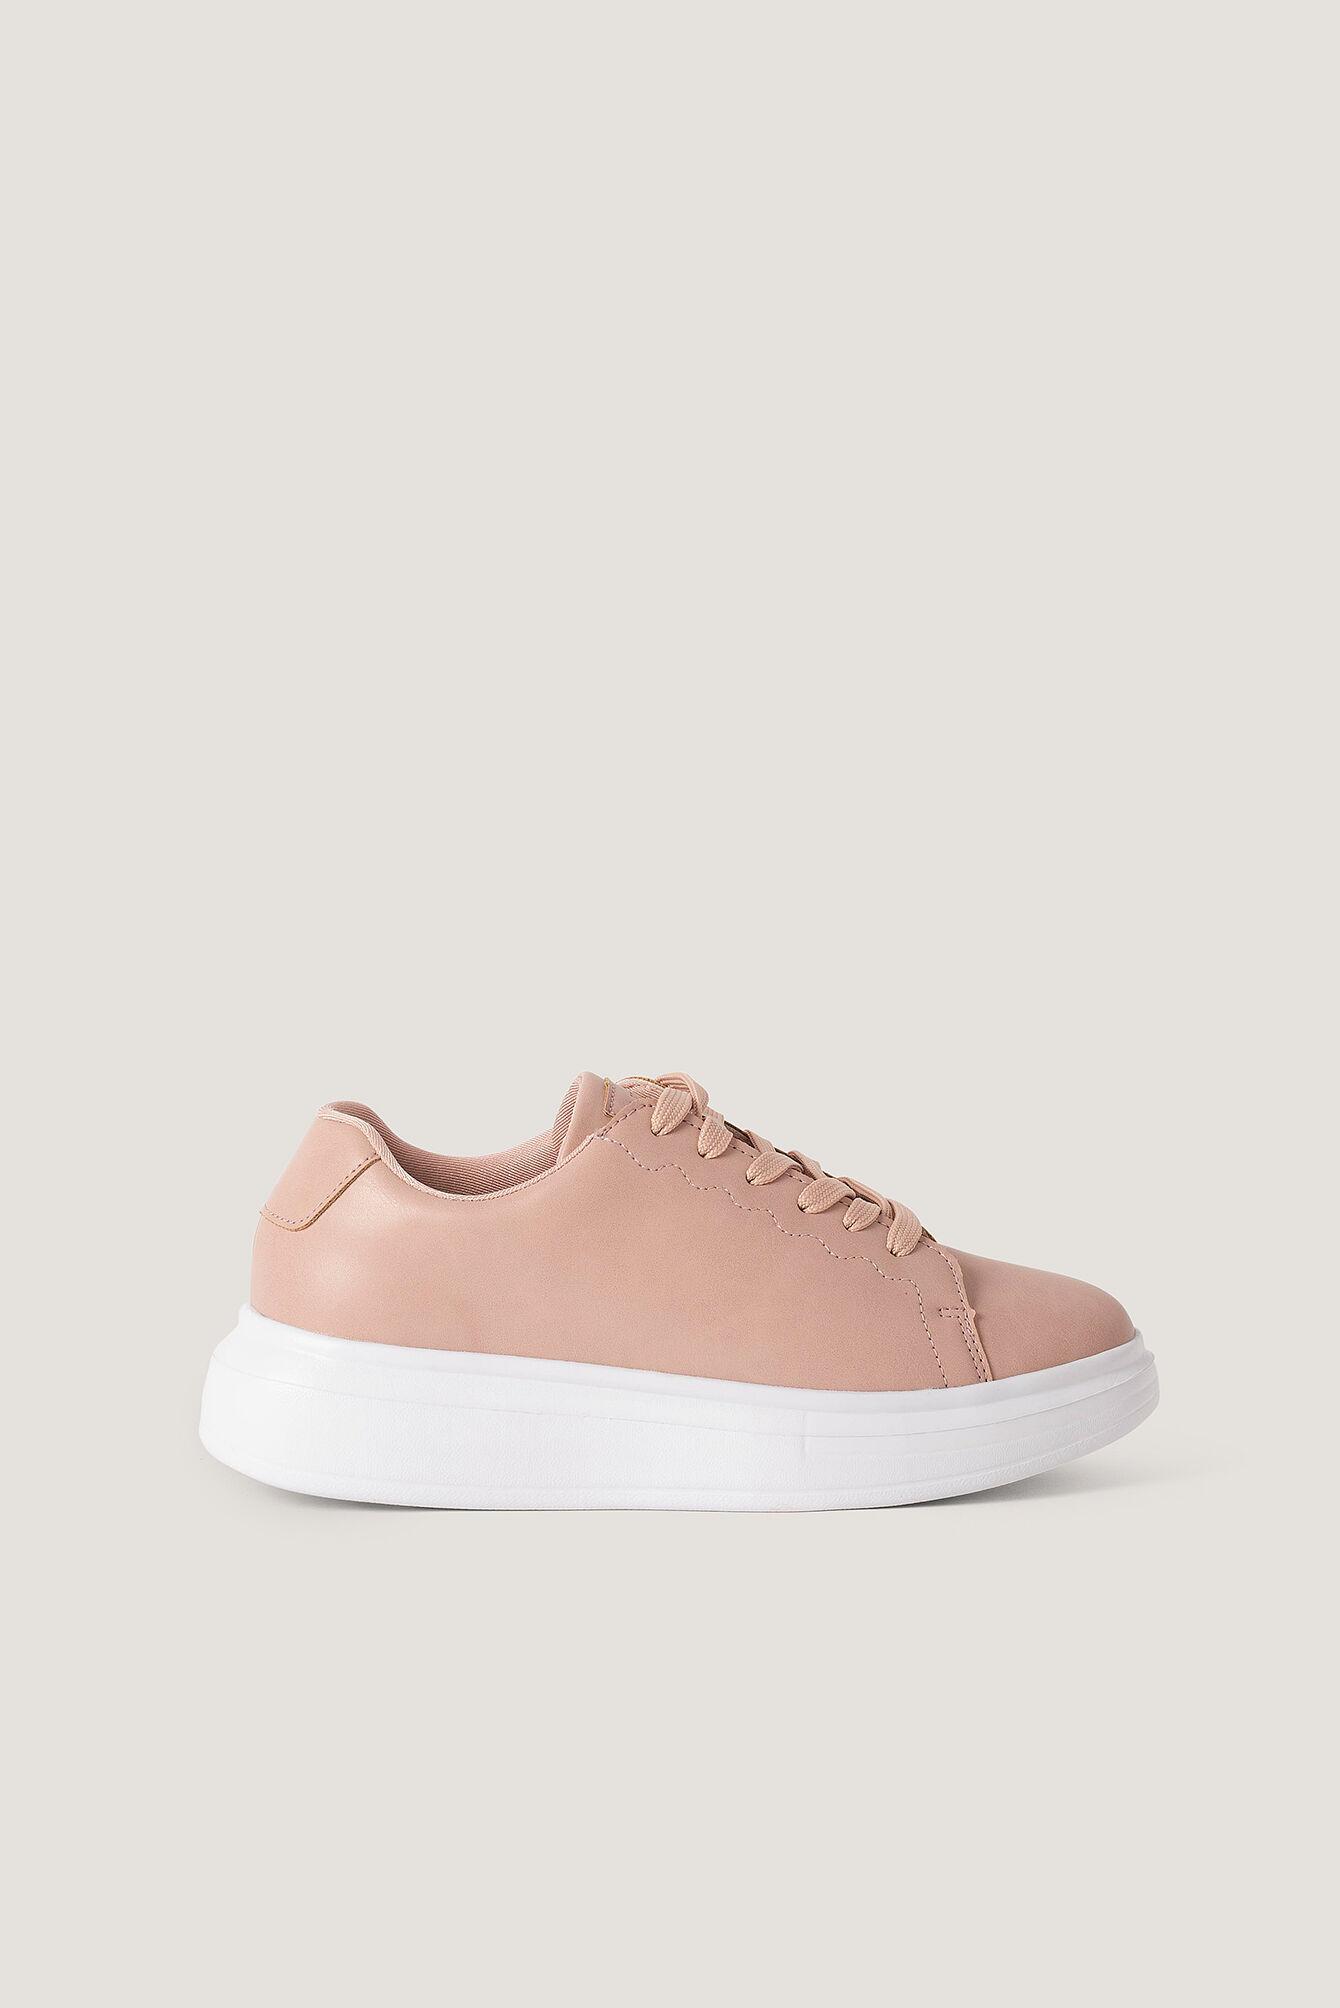 NA-KD Shoes Basic Court Trainers - Pink  - Size: EU 36,EU 37,EU 38,EU 39,EU 40,EU 41